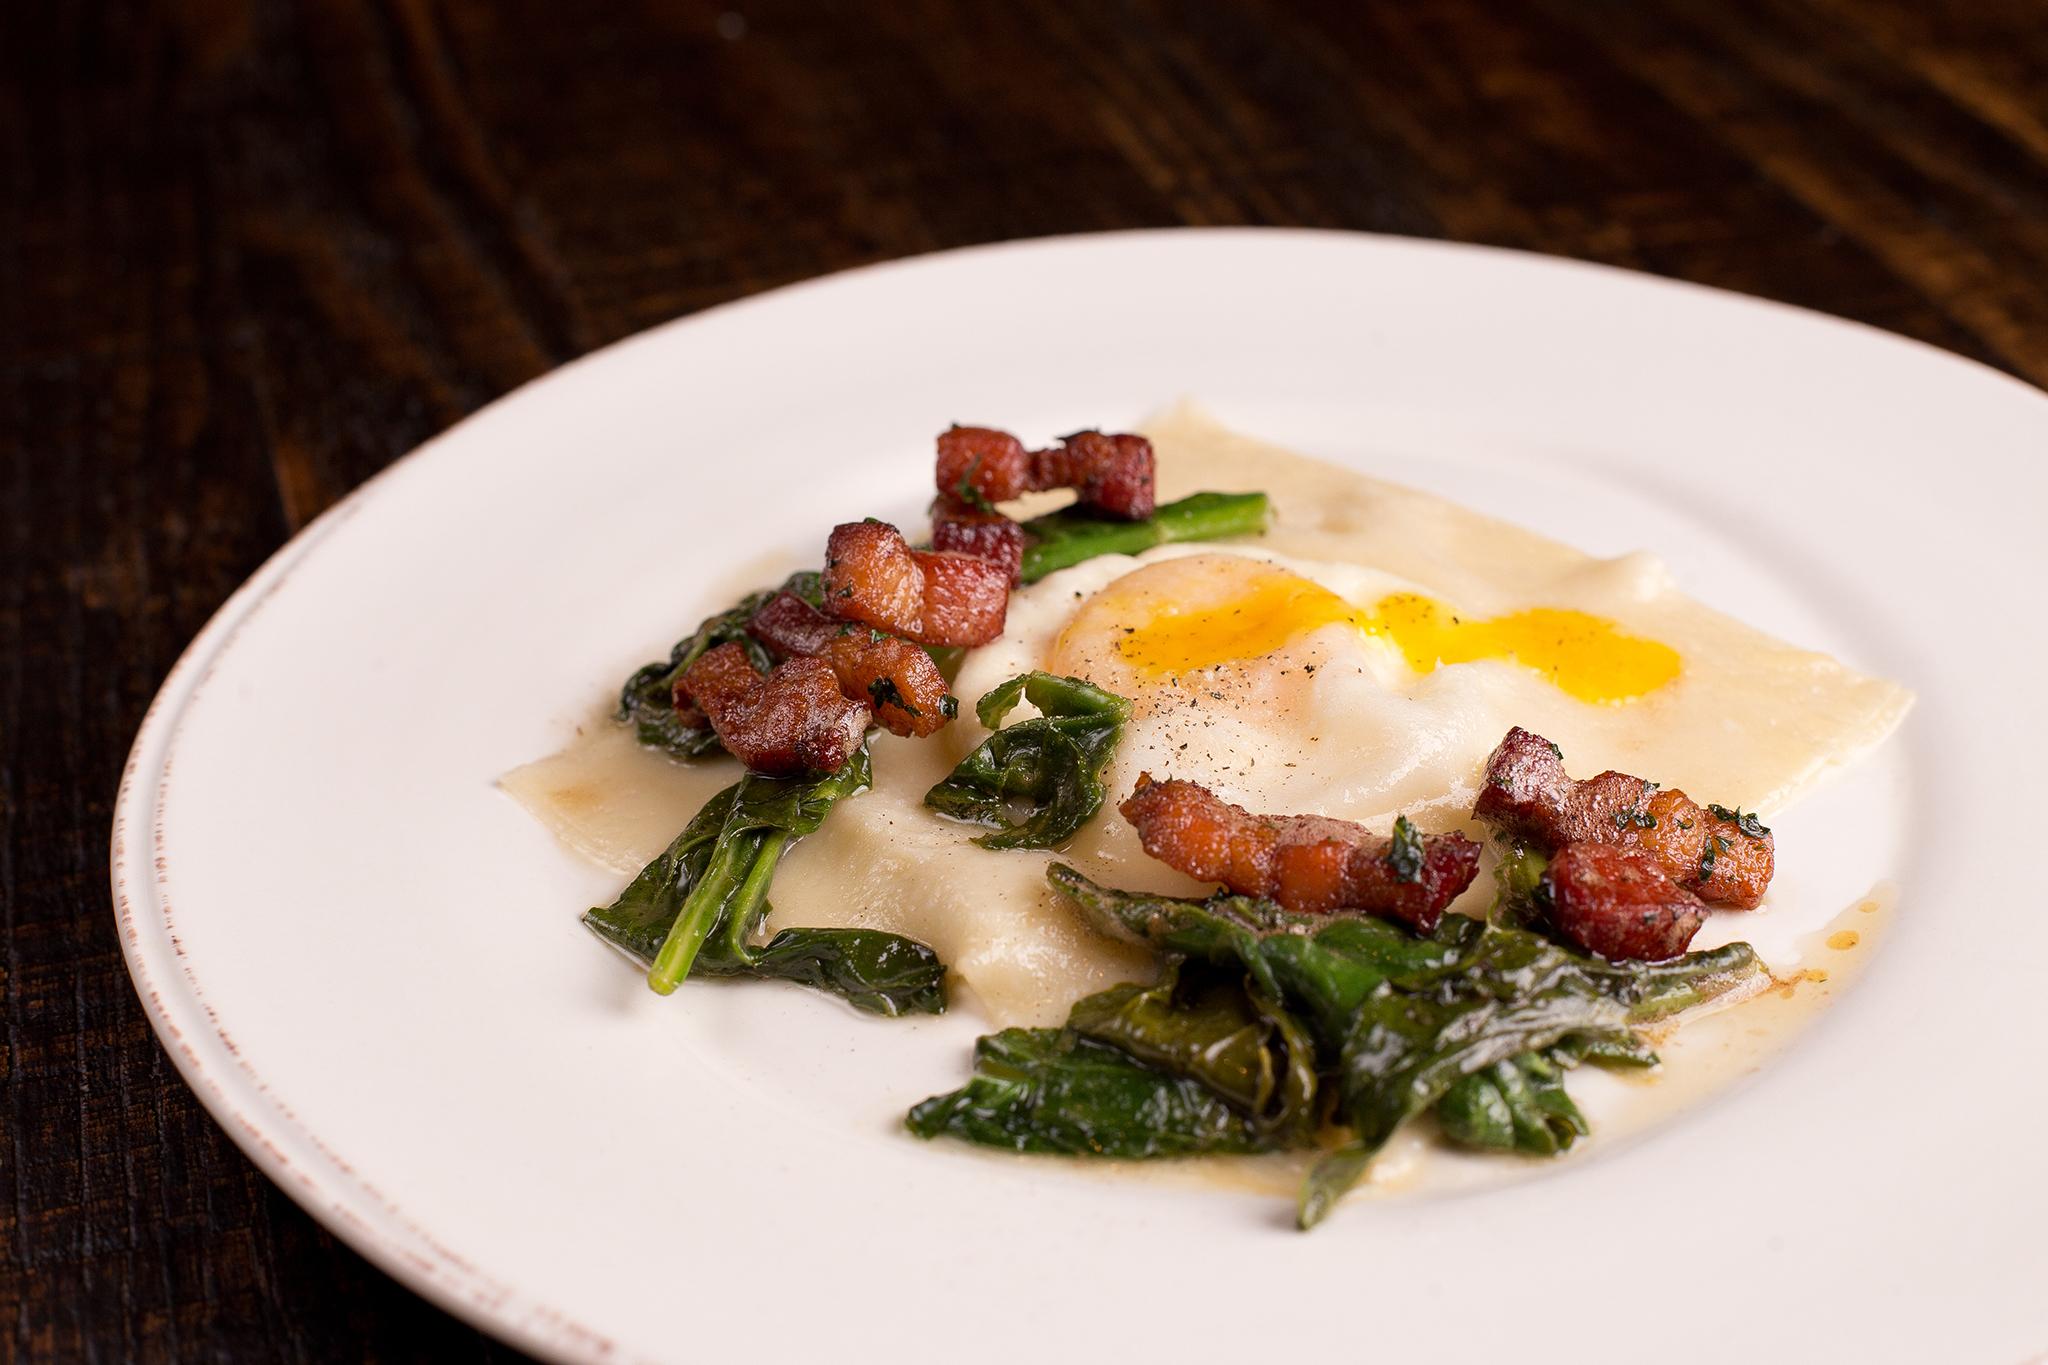 Bacon and eggs ravioli at Tanzy